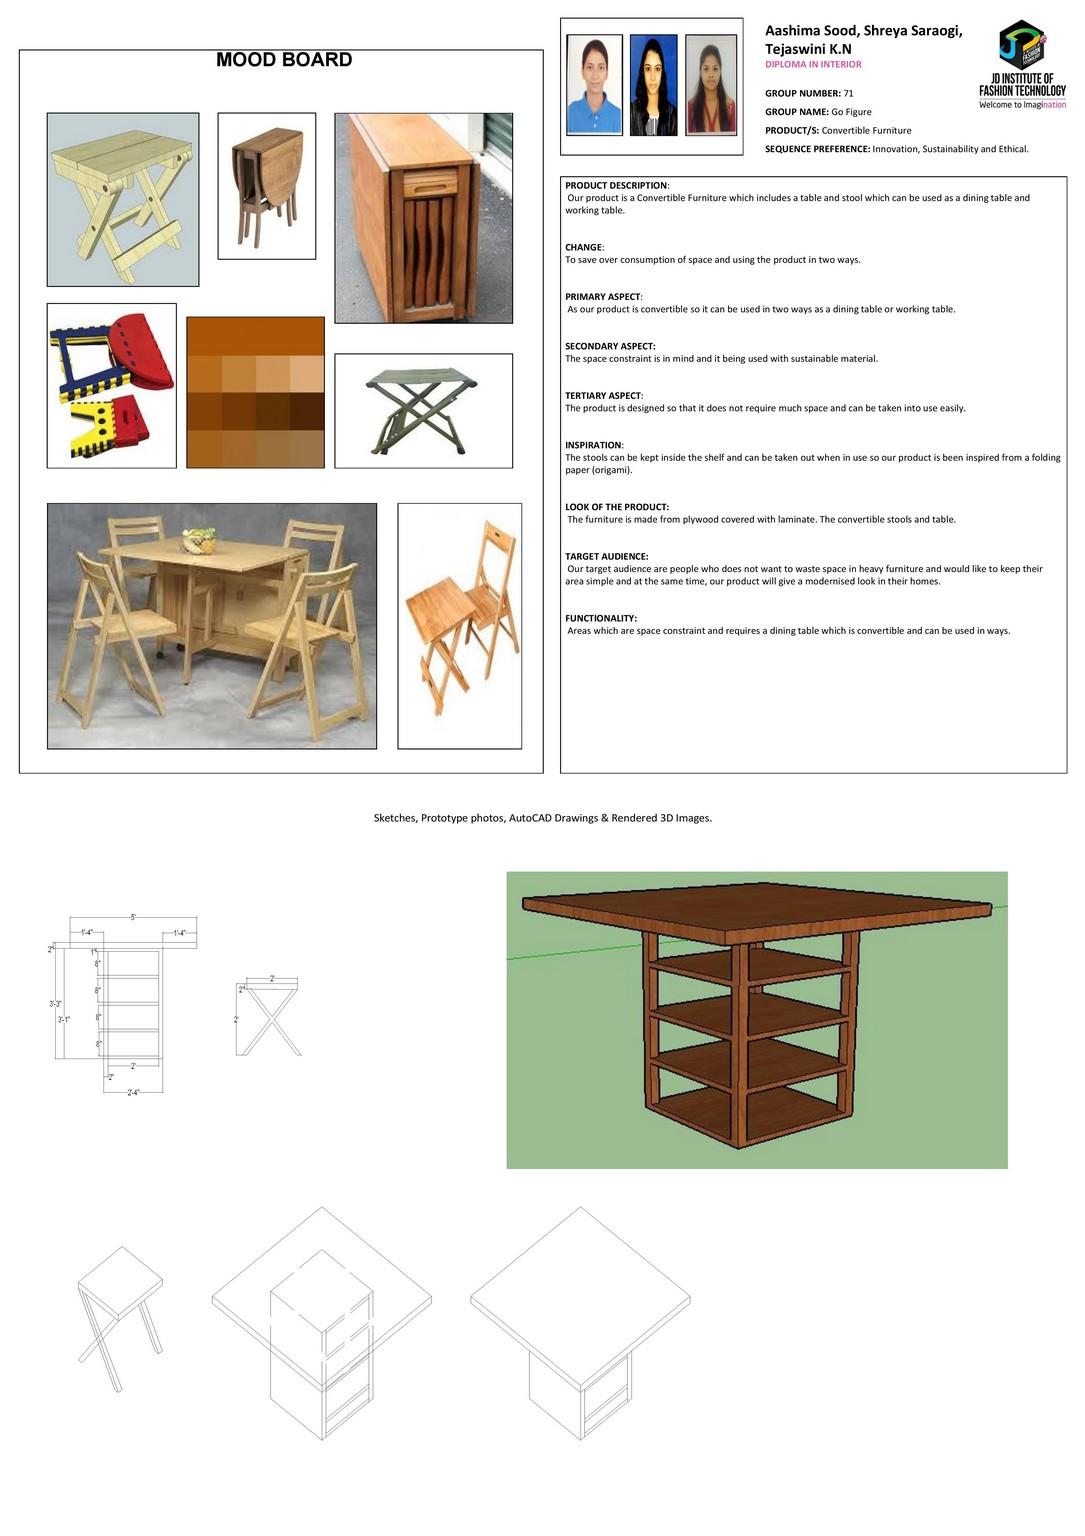 Foldable Dining Table – CHANGE – JD ANNUAL DESIGN AWARDS 2018 | Designer: Aashima Sood, Shreya Saraogi, Tejaswini K.N | Photography : Jerin Nath (@jerin_nath) foldable dining table - foldable - Foldable Dining Table – CHANGE – JD Annual Design Awards 2018